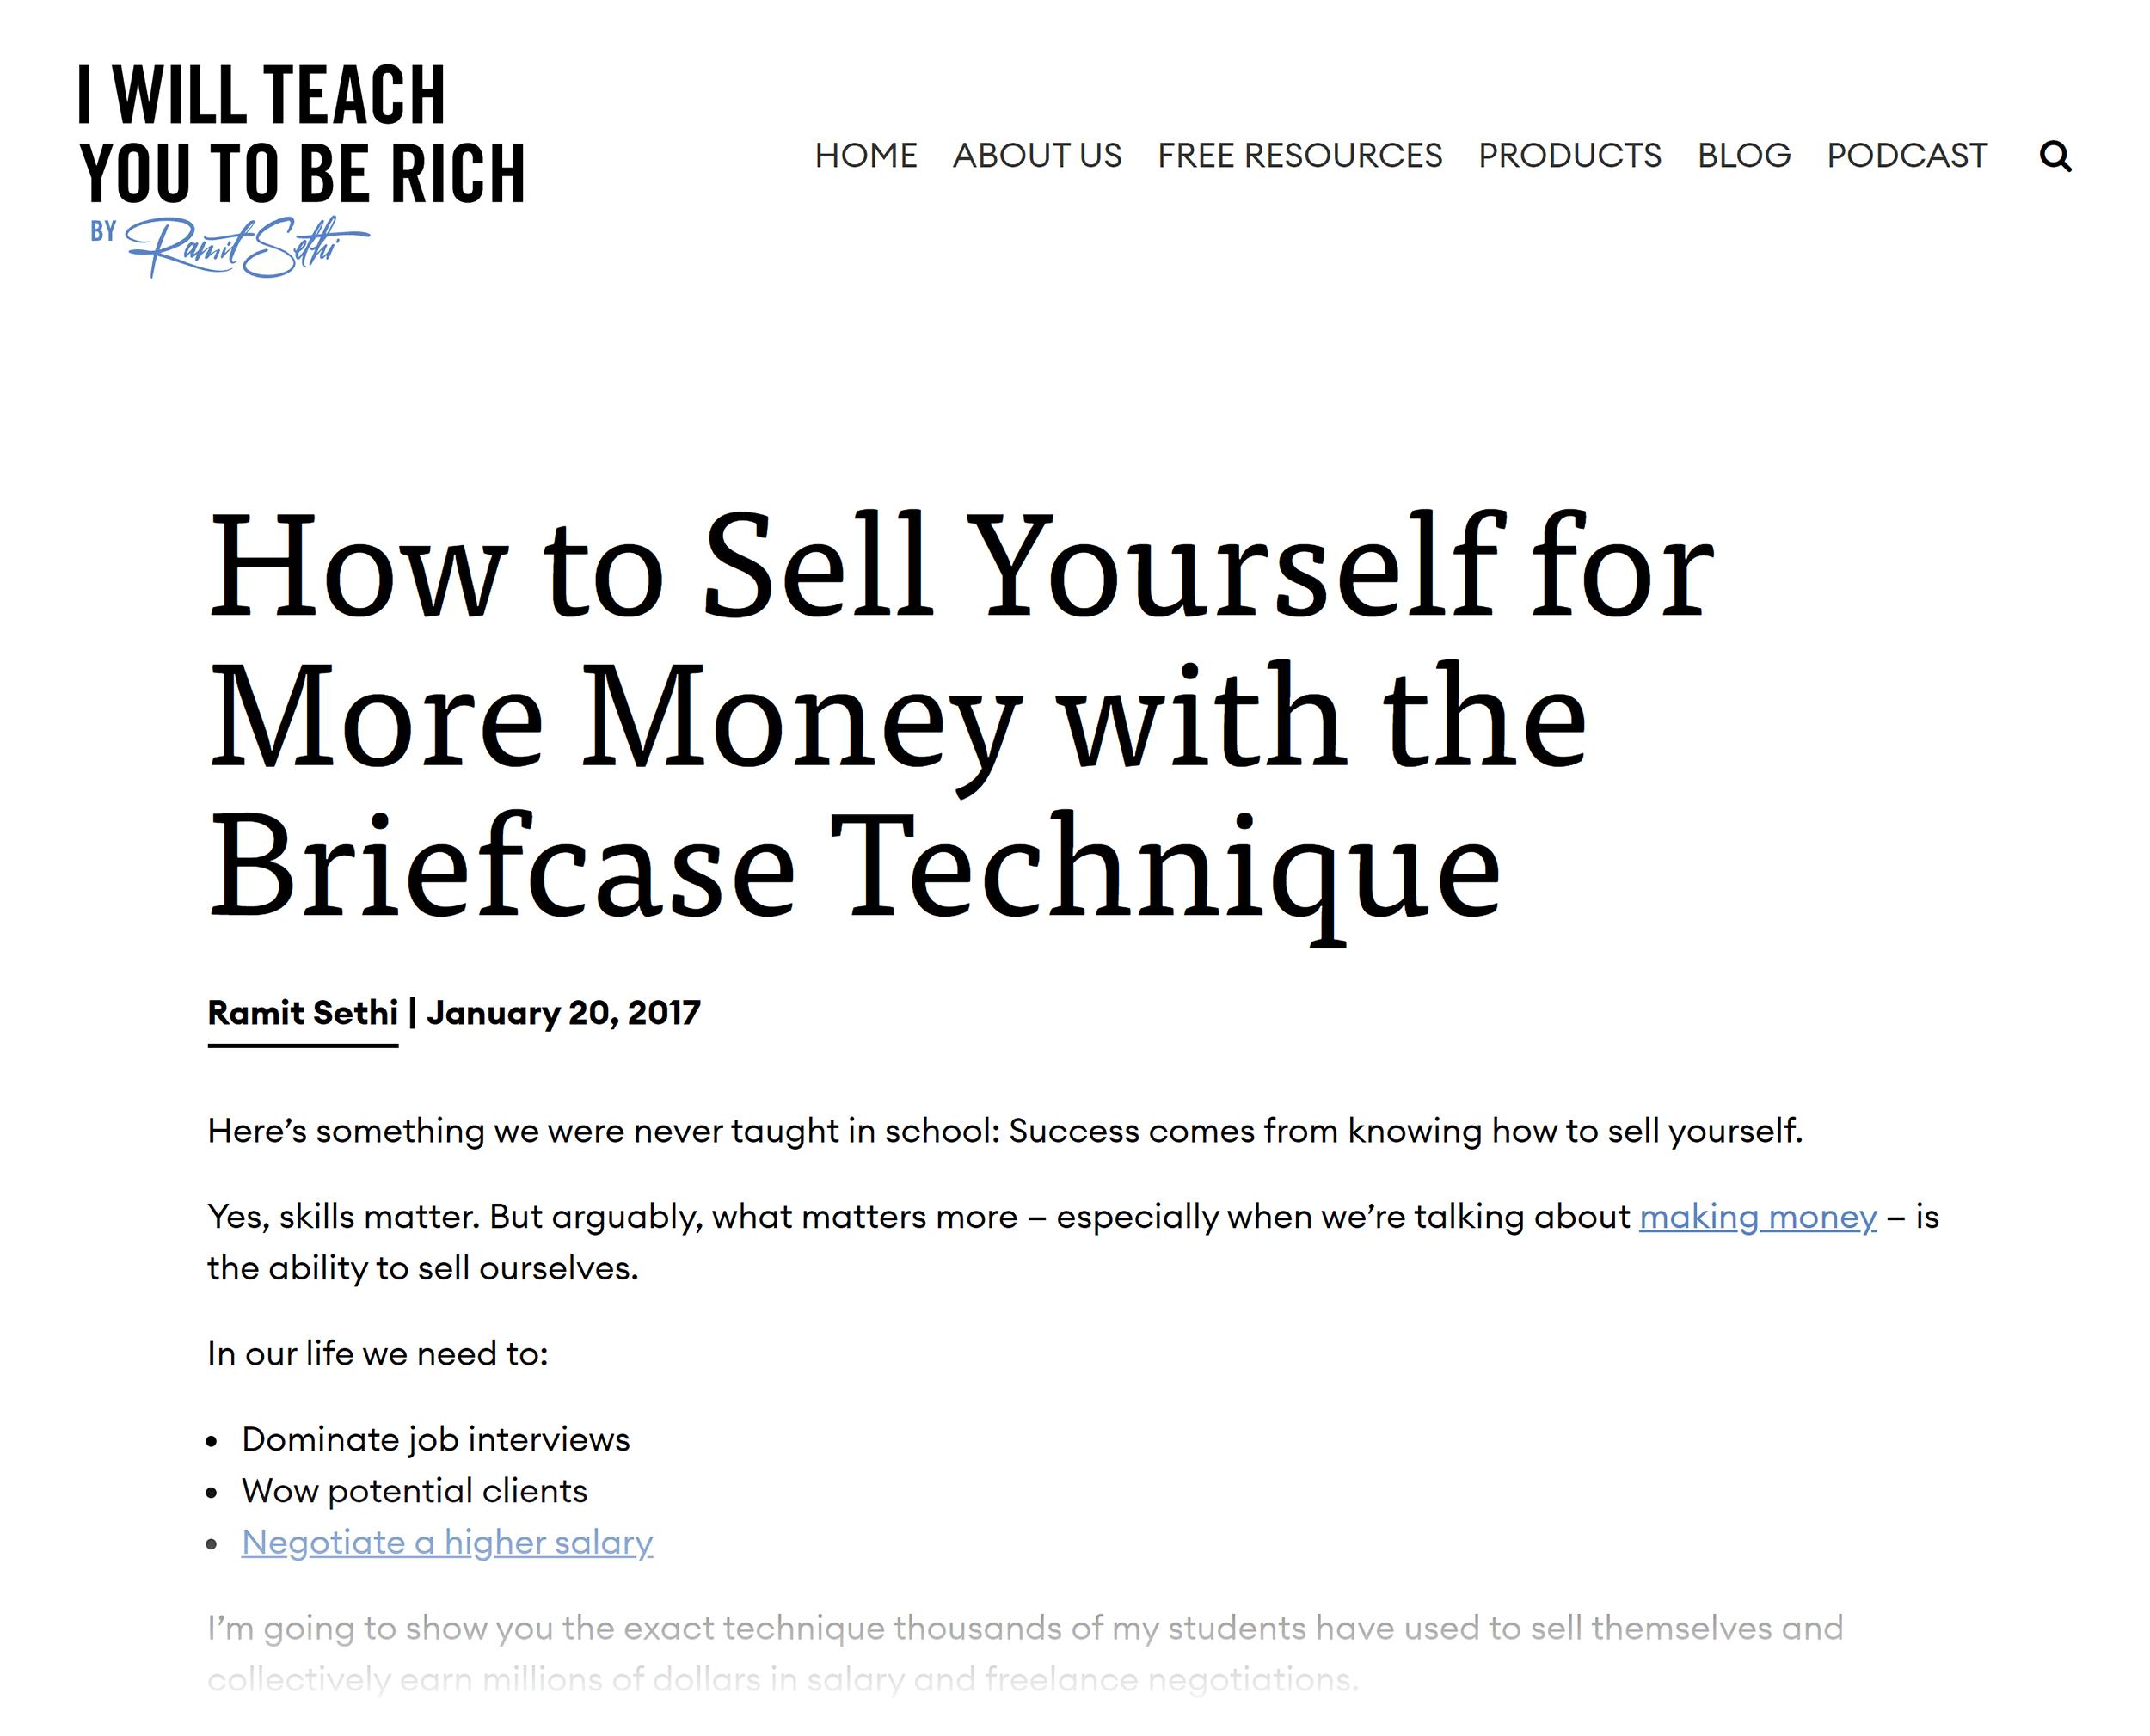 Ramit Sethi – The briefcase technique